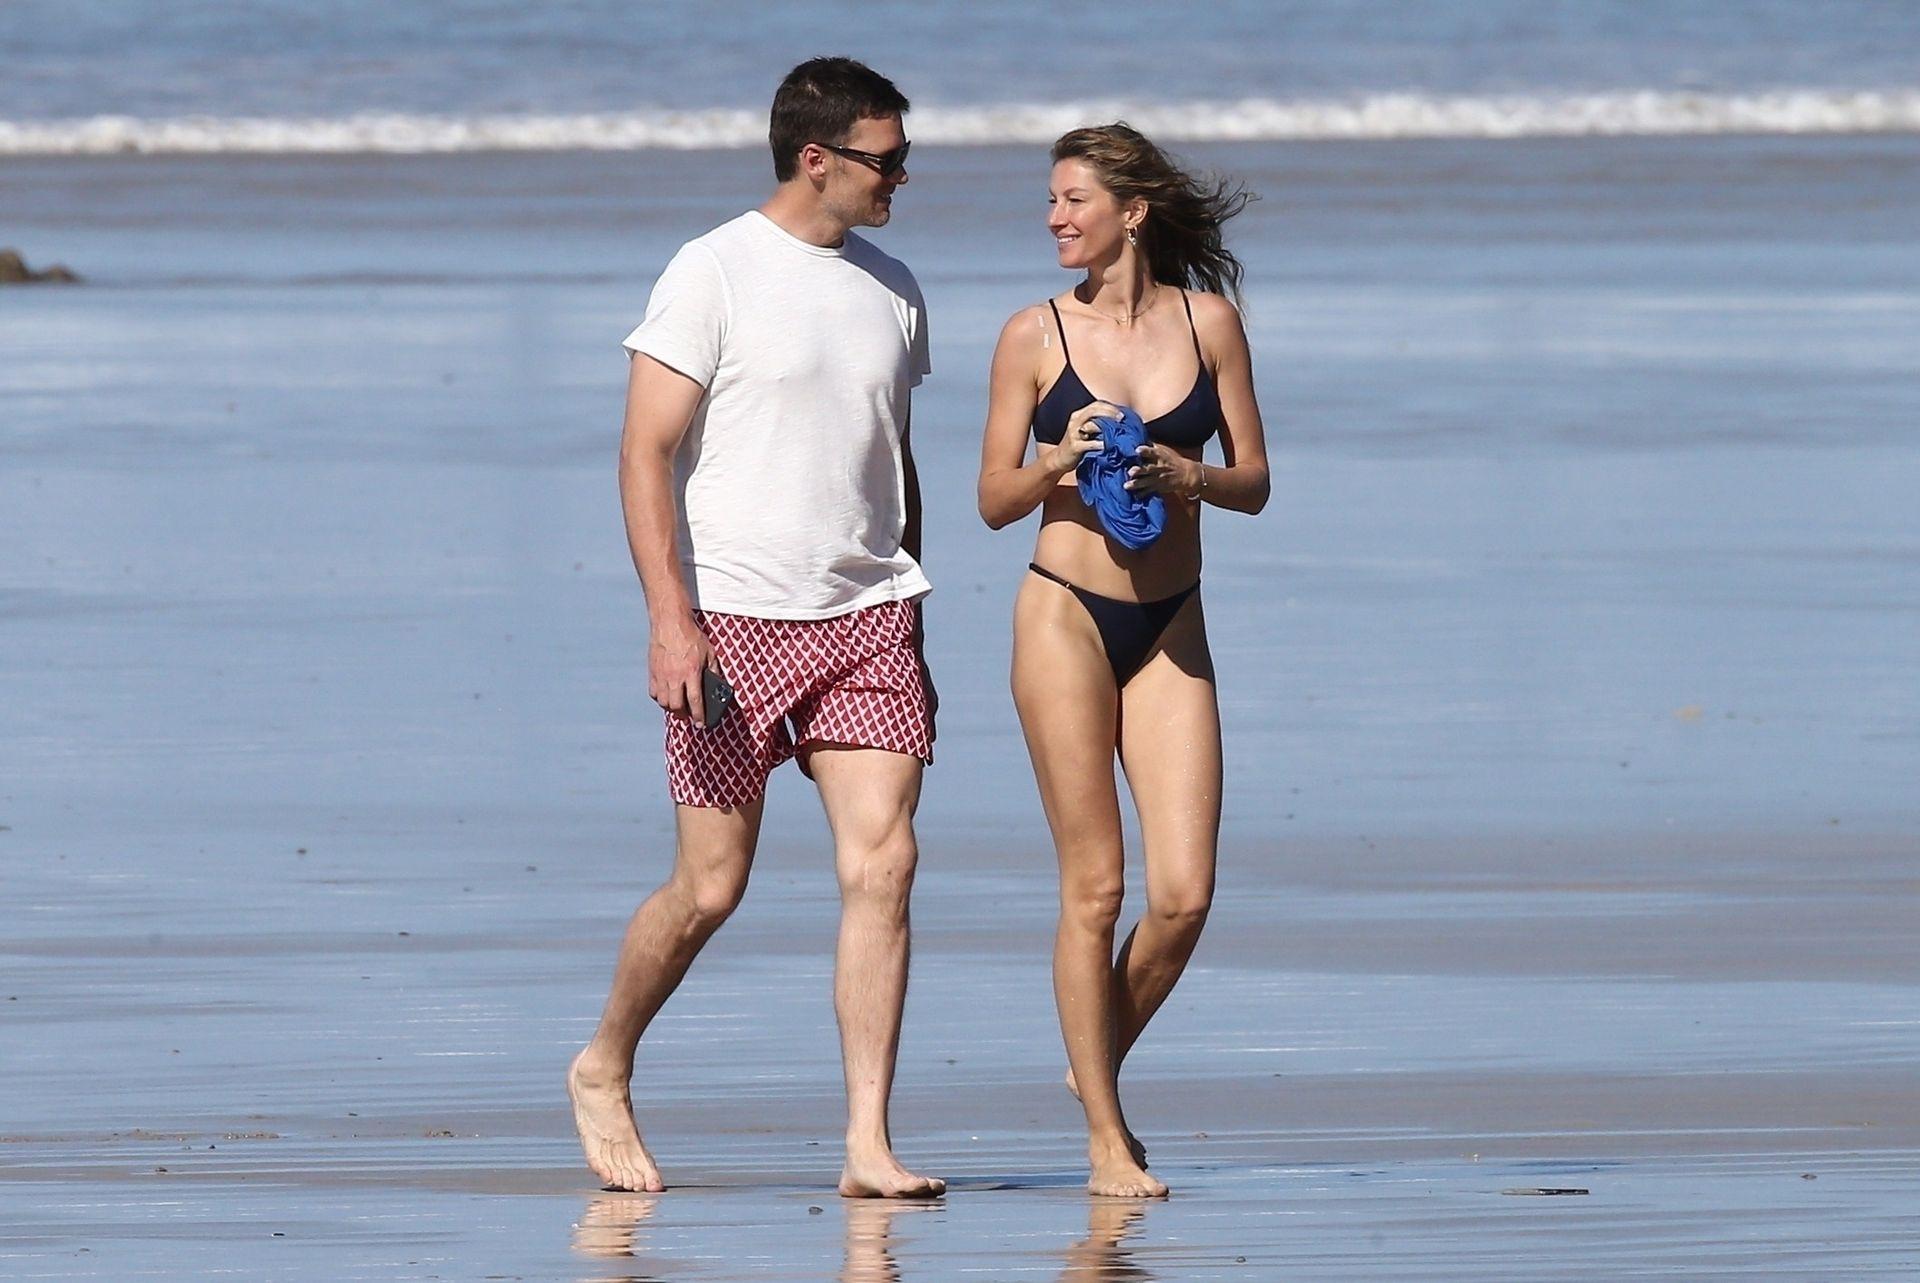 Tom Brady & Gisele Bundchen Pack On The Pda At The Beach 0017